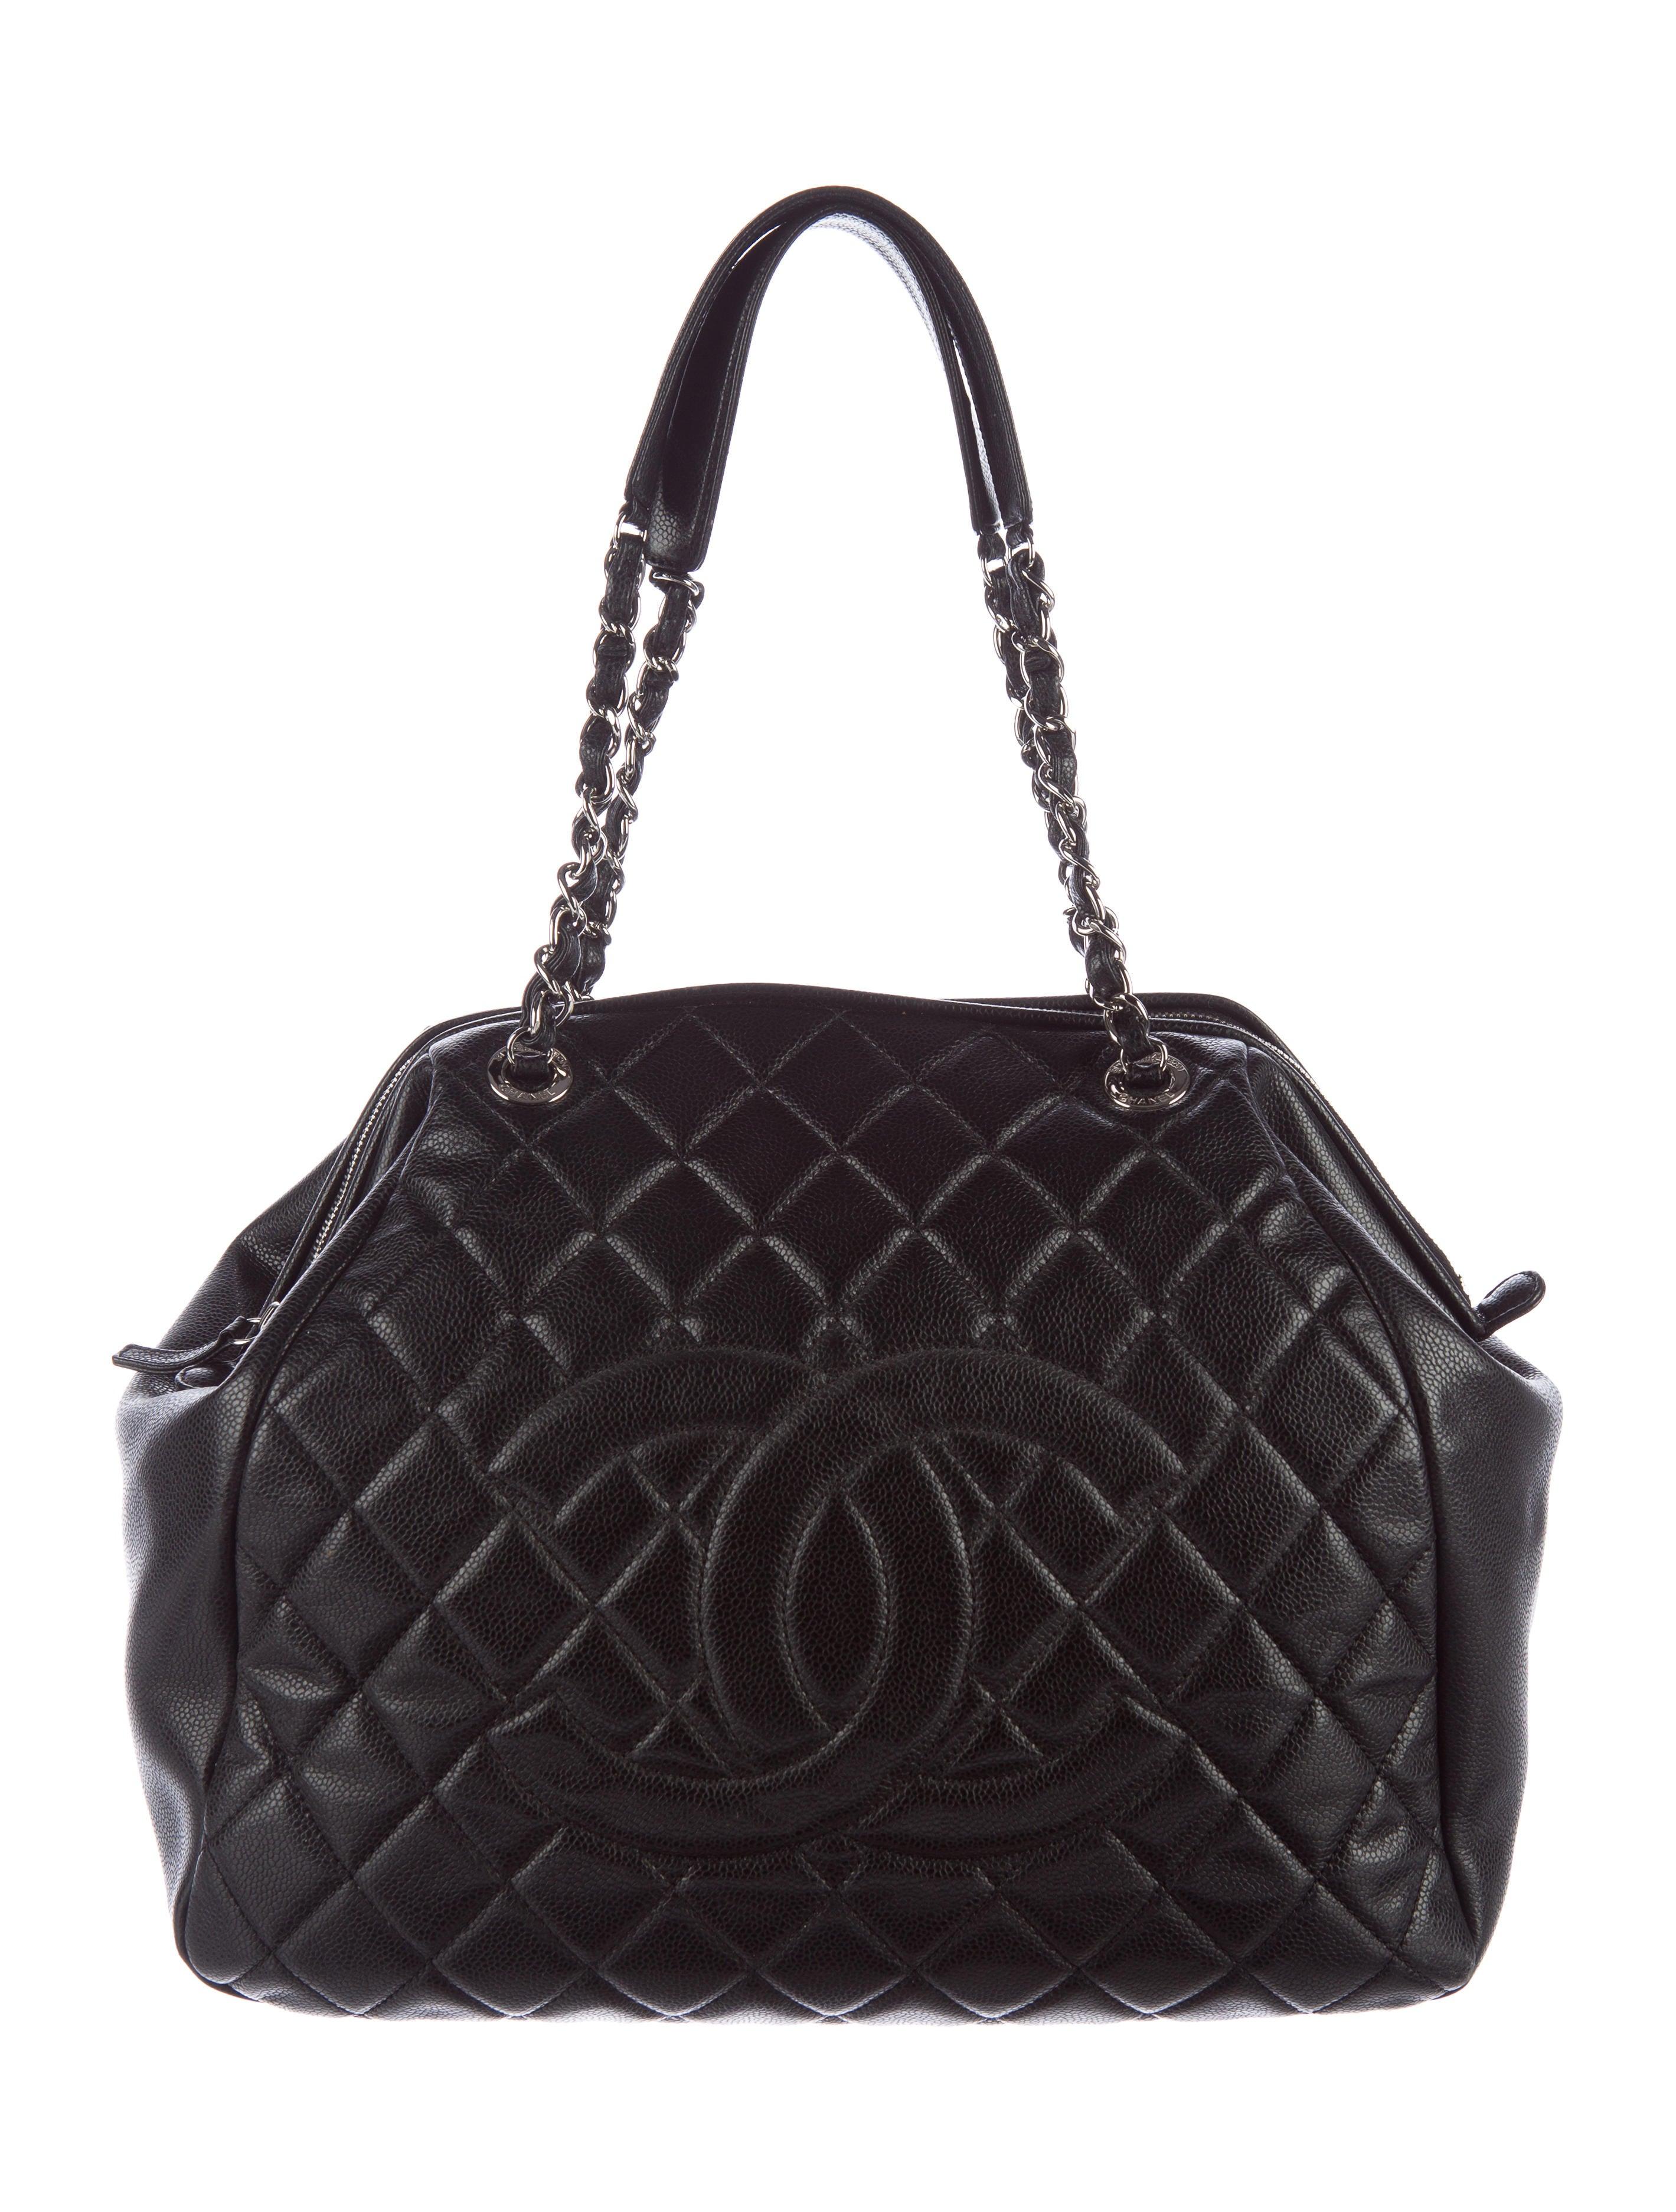 Chanel Timeless Caviar Framed Bag - Handbags